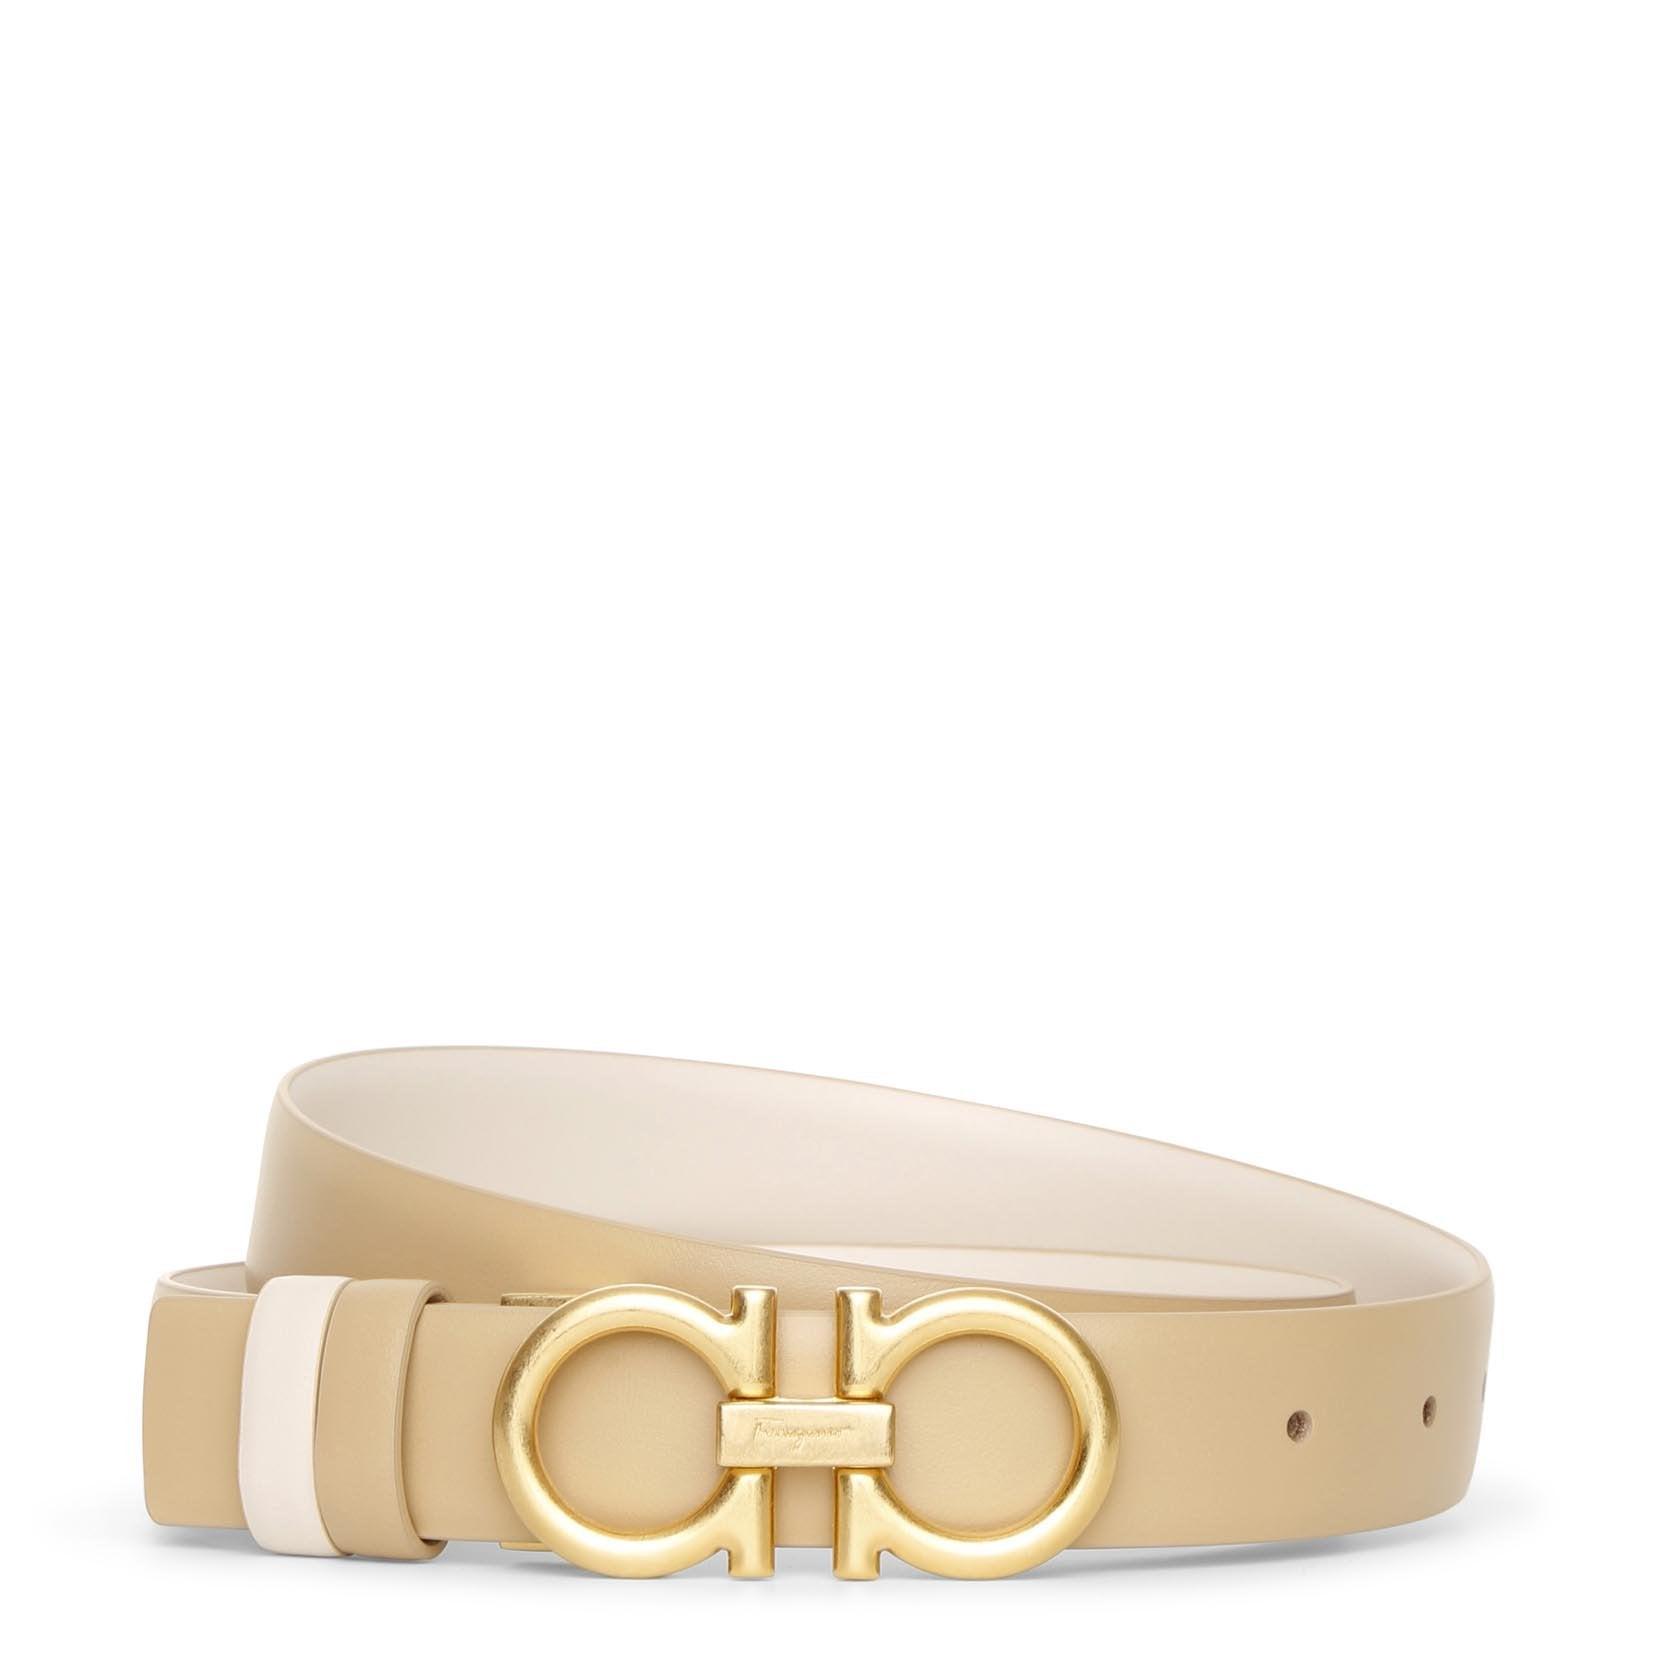 Salvatore Ferragamo Reversable and adjustable beige cream leather belt  - beige/white - female - Size: 95